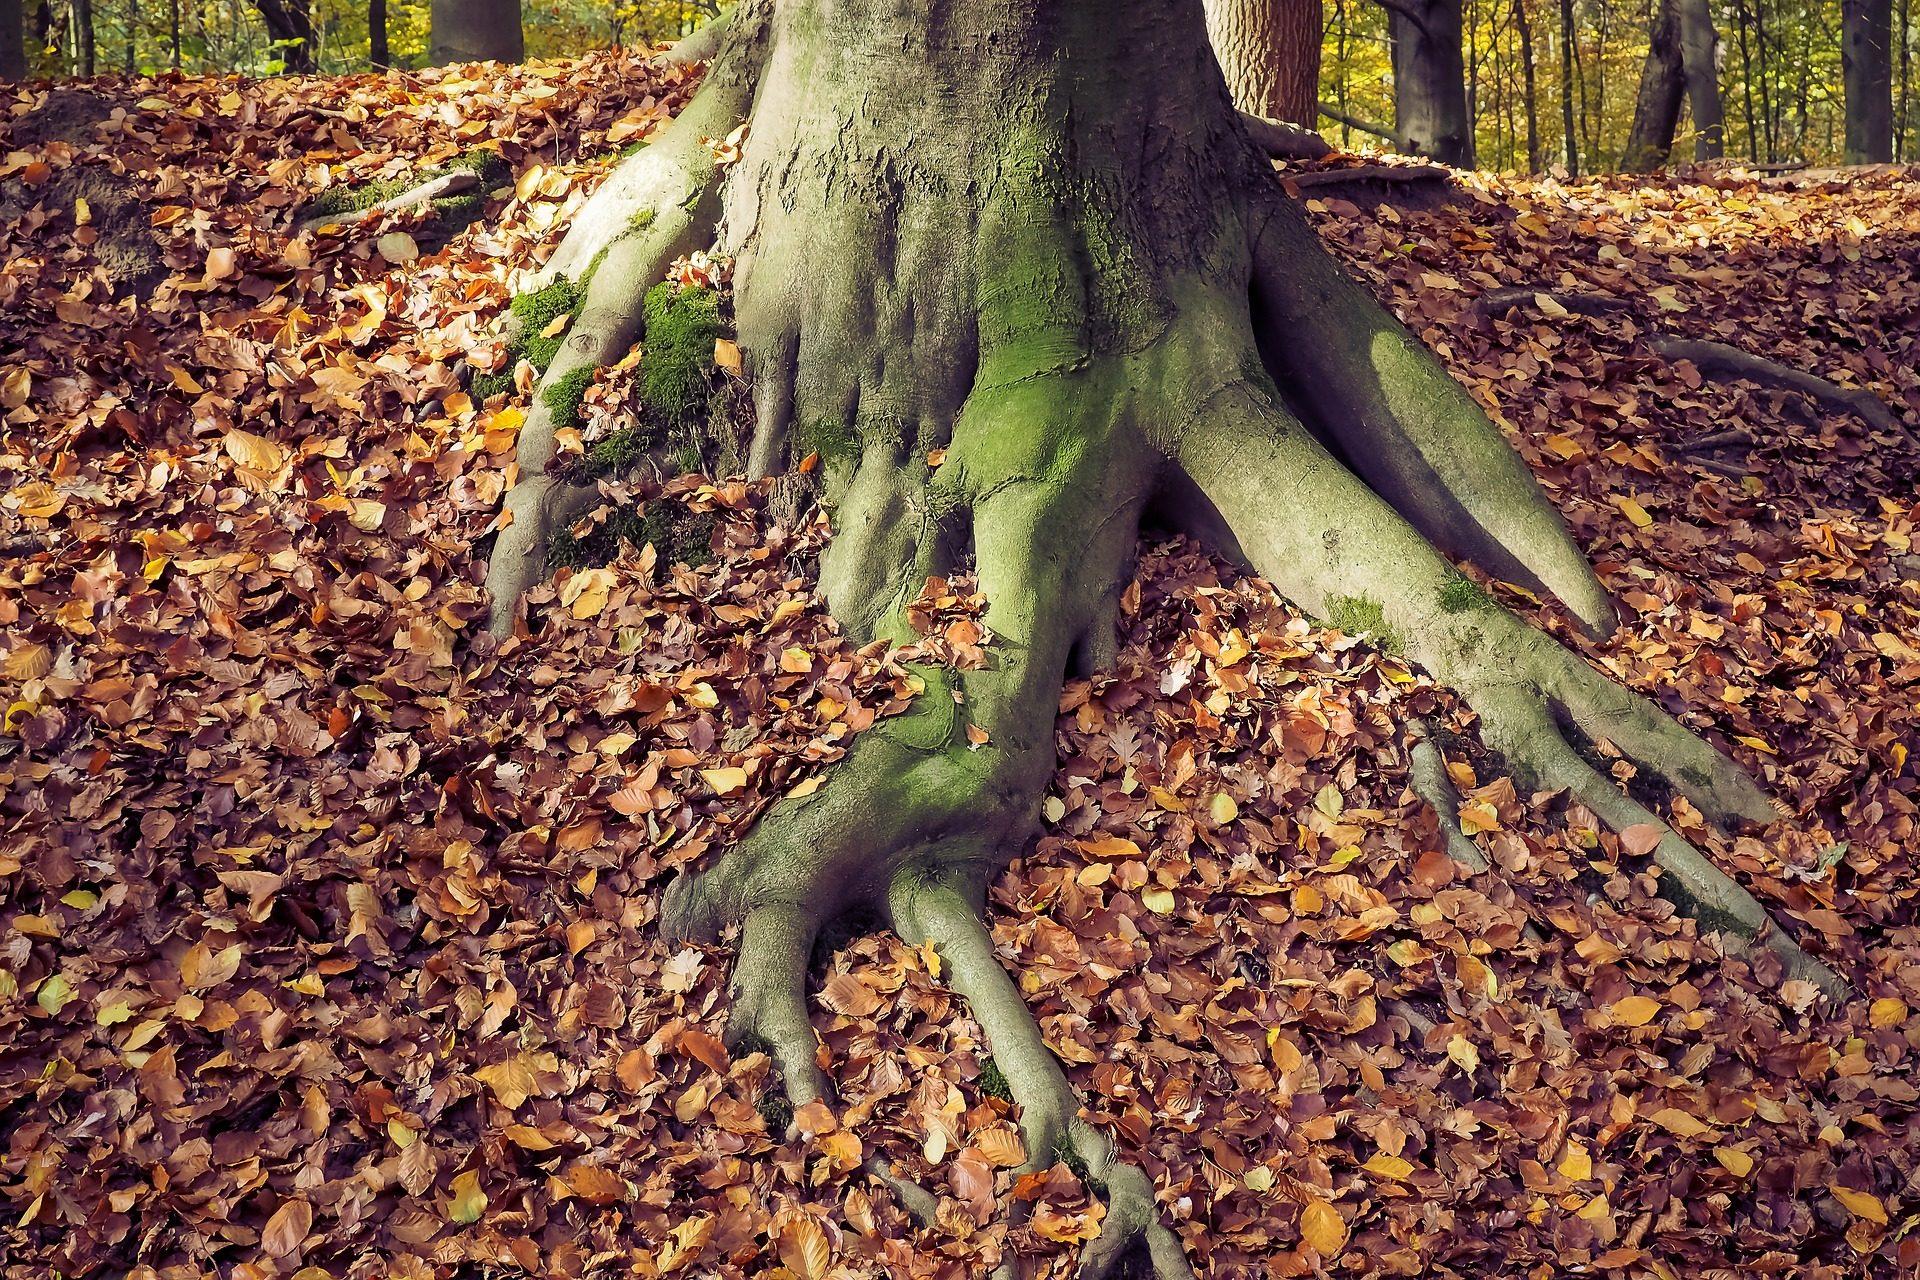 arbre, racines, feuilles, litière de feuilles, Forest - Fonds d'écran HD - Professor-falken.com